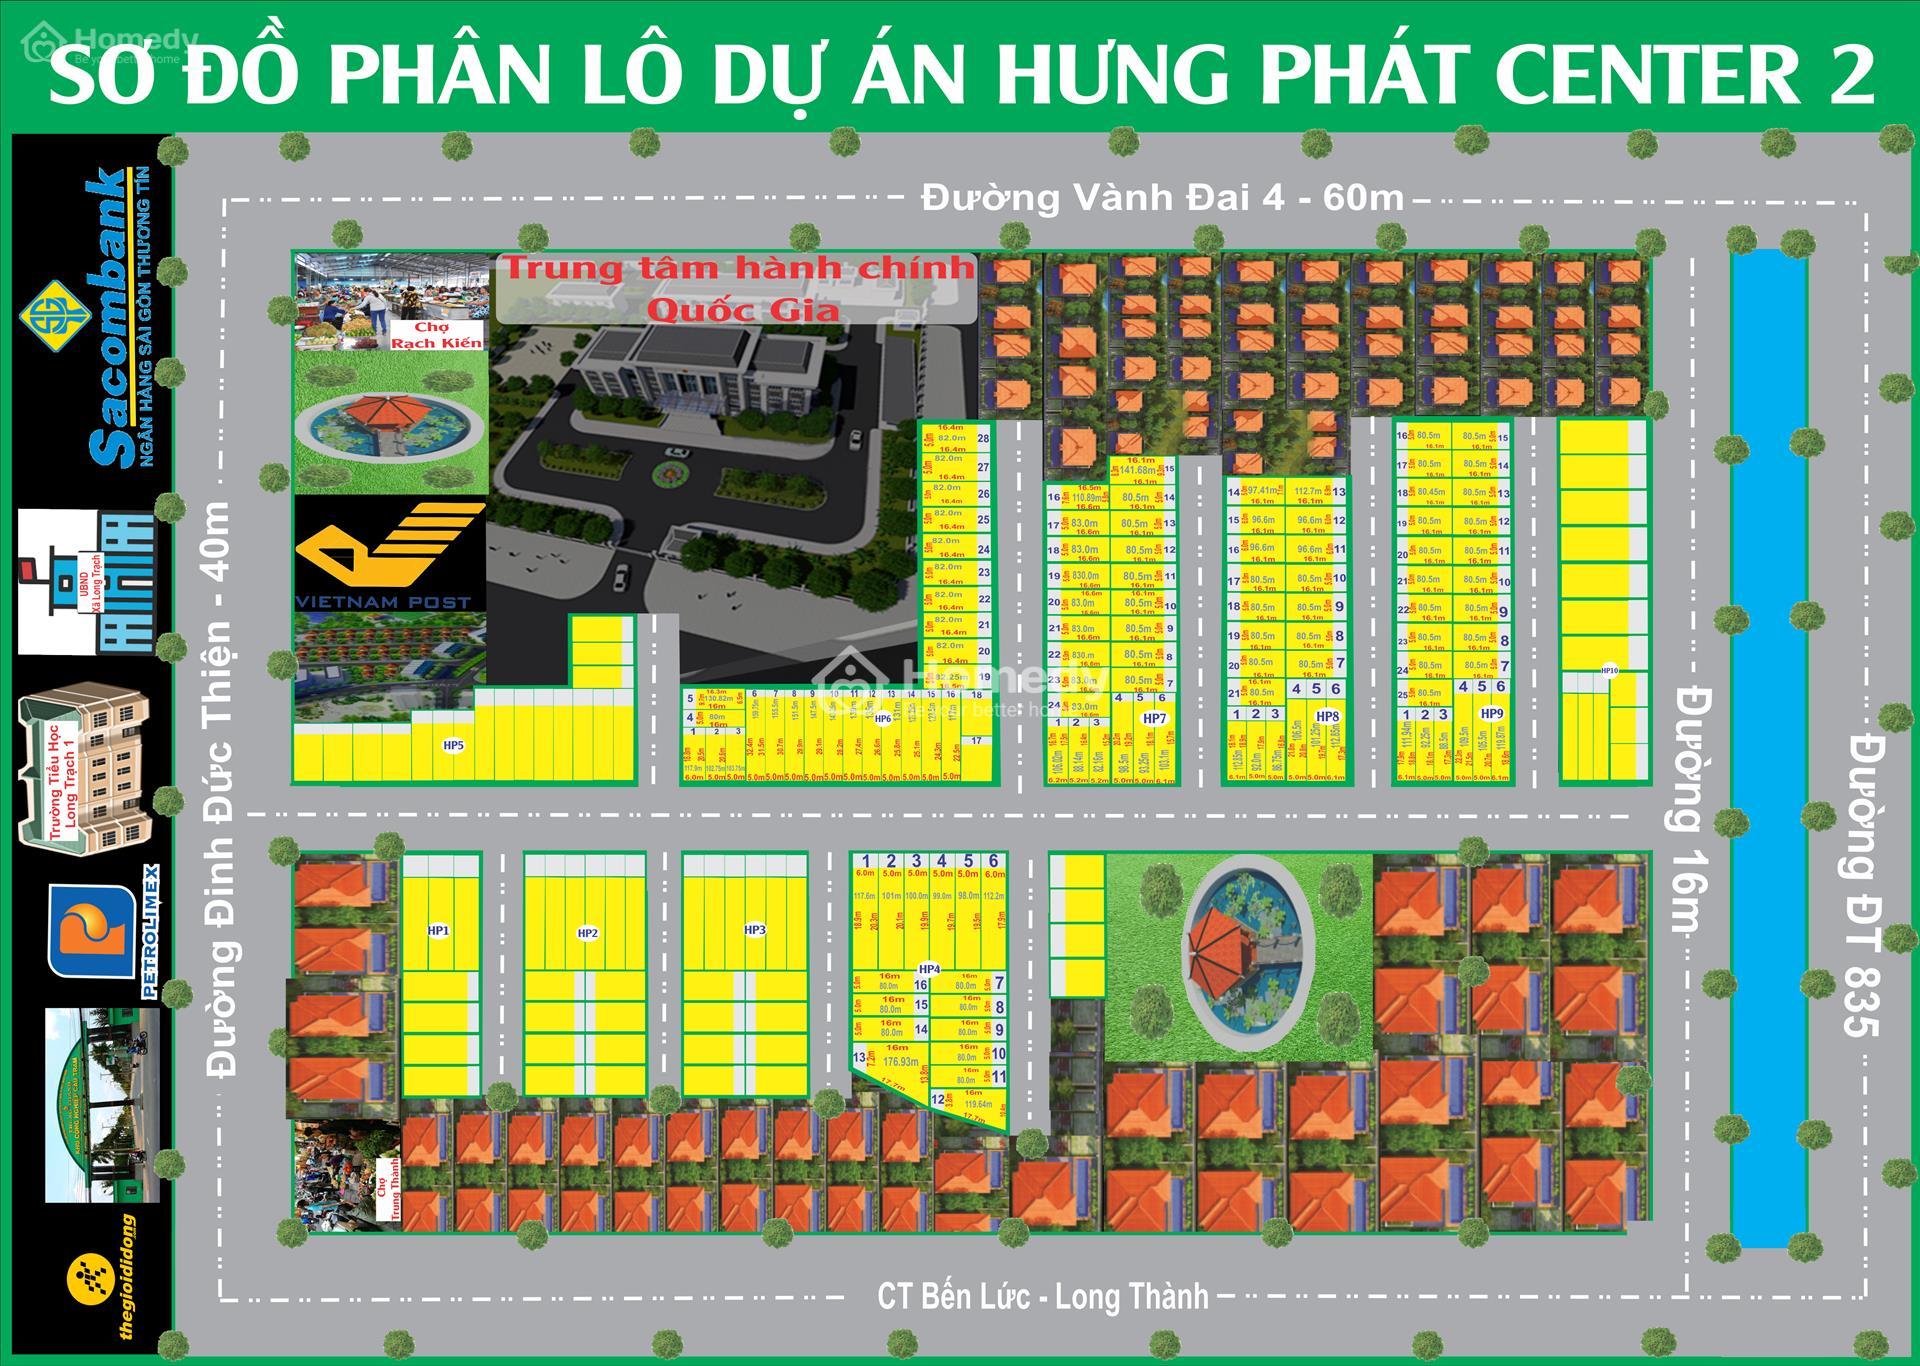 hung phat center